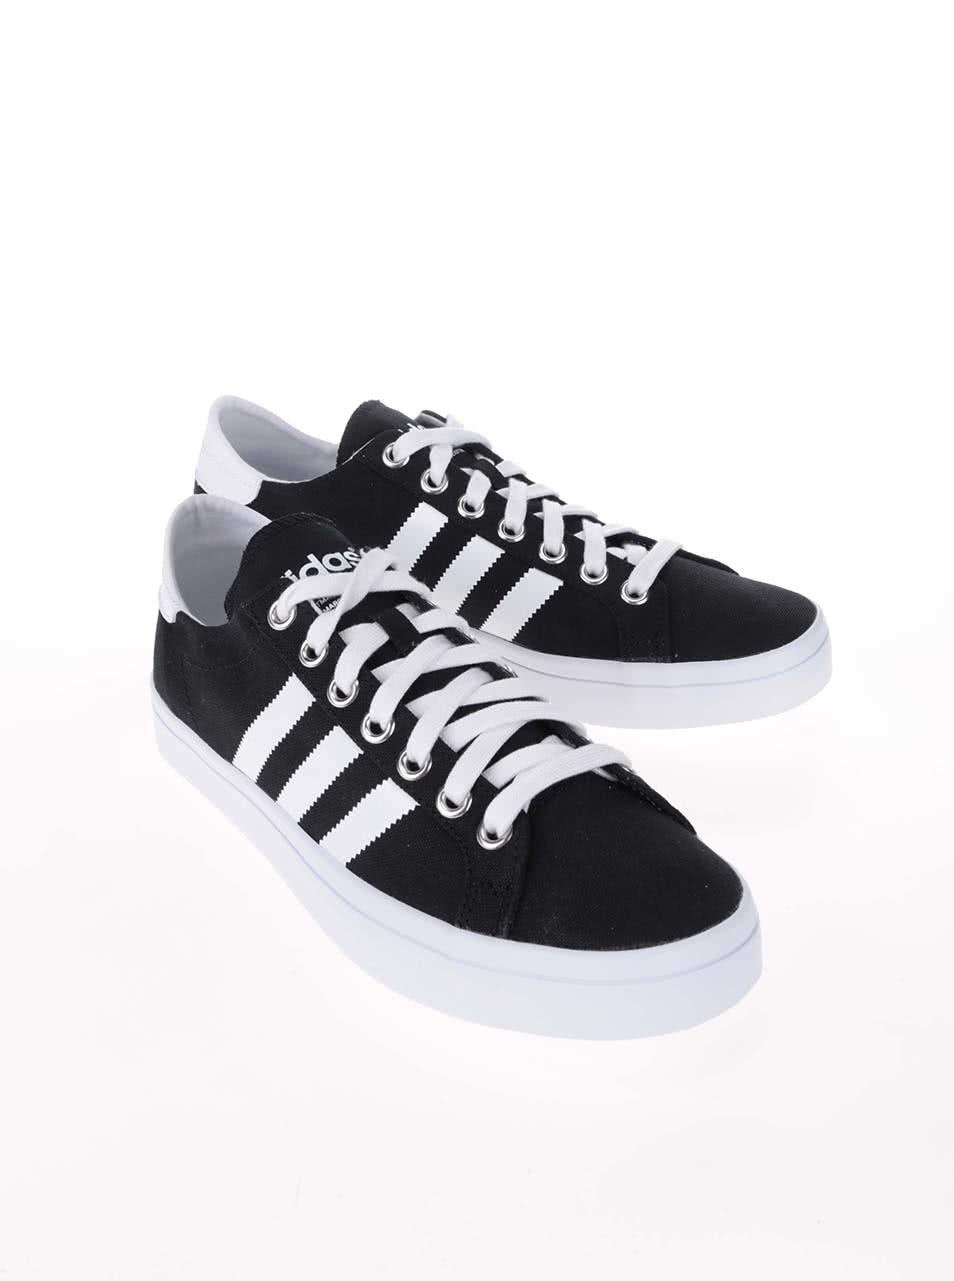 Černé pánské plátěné tenisky adidas Originals Court Vantage ... 0e169cbda7